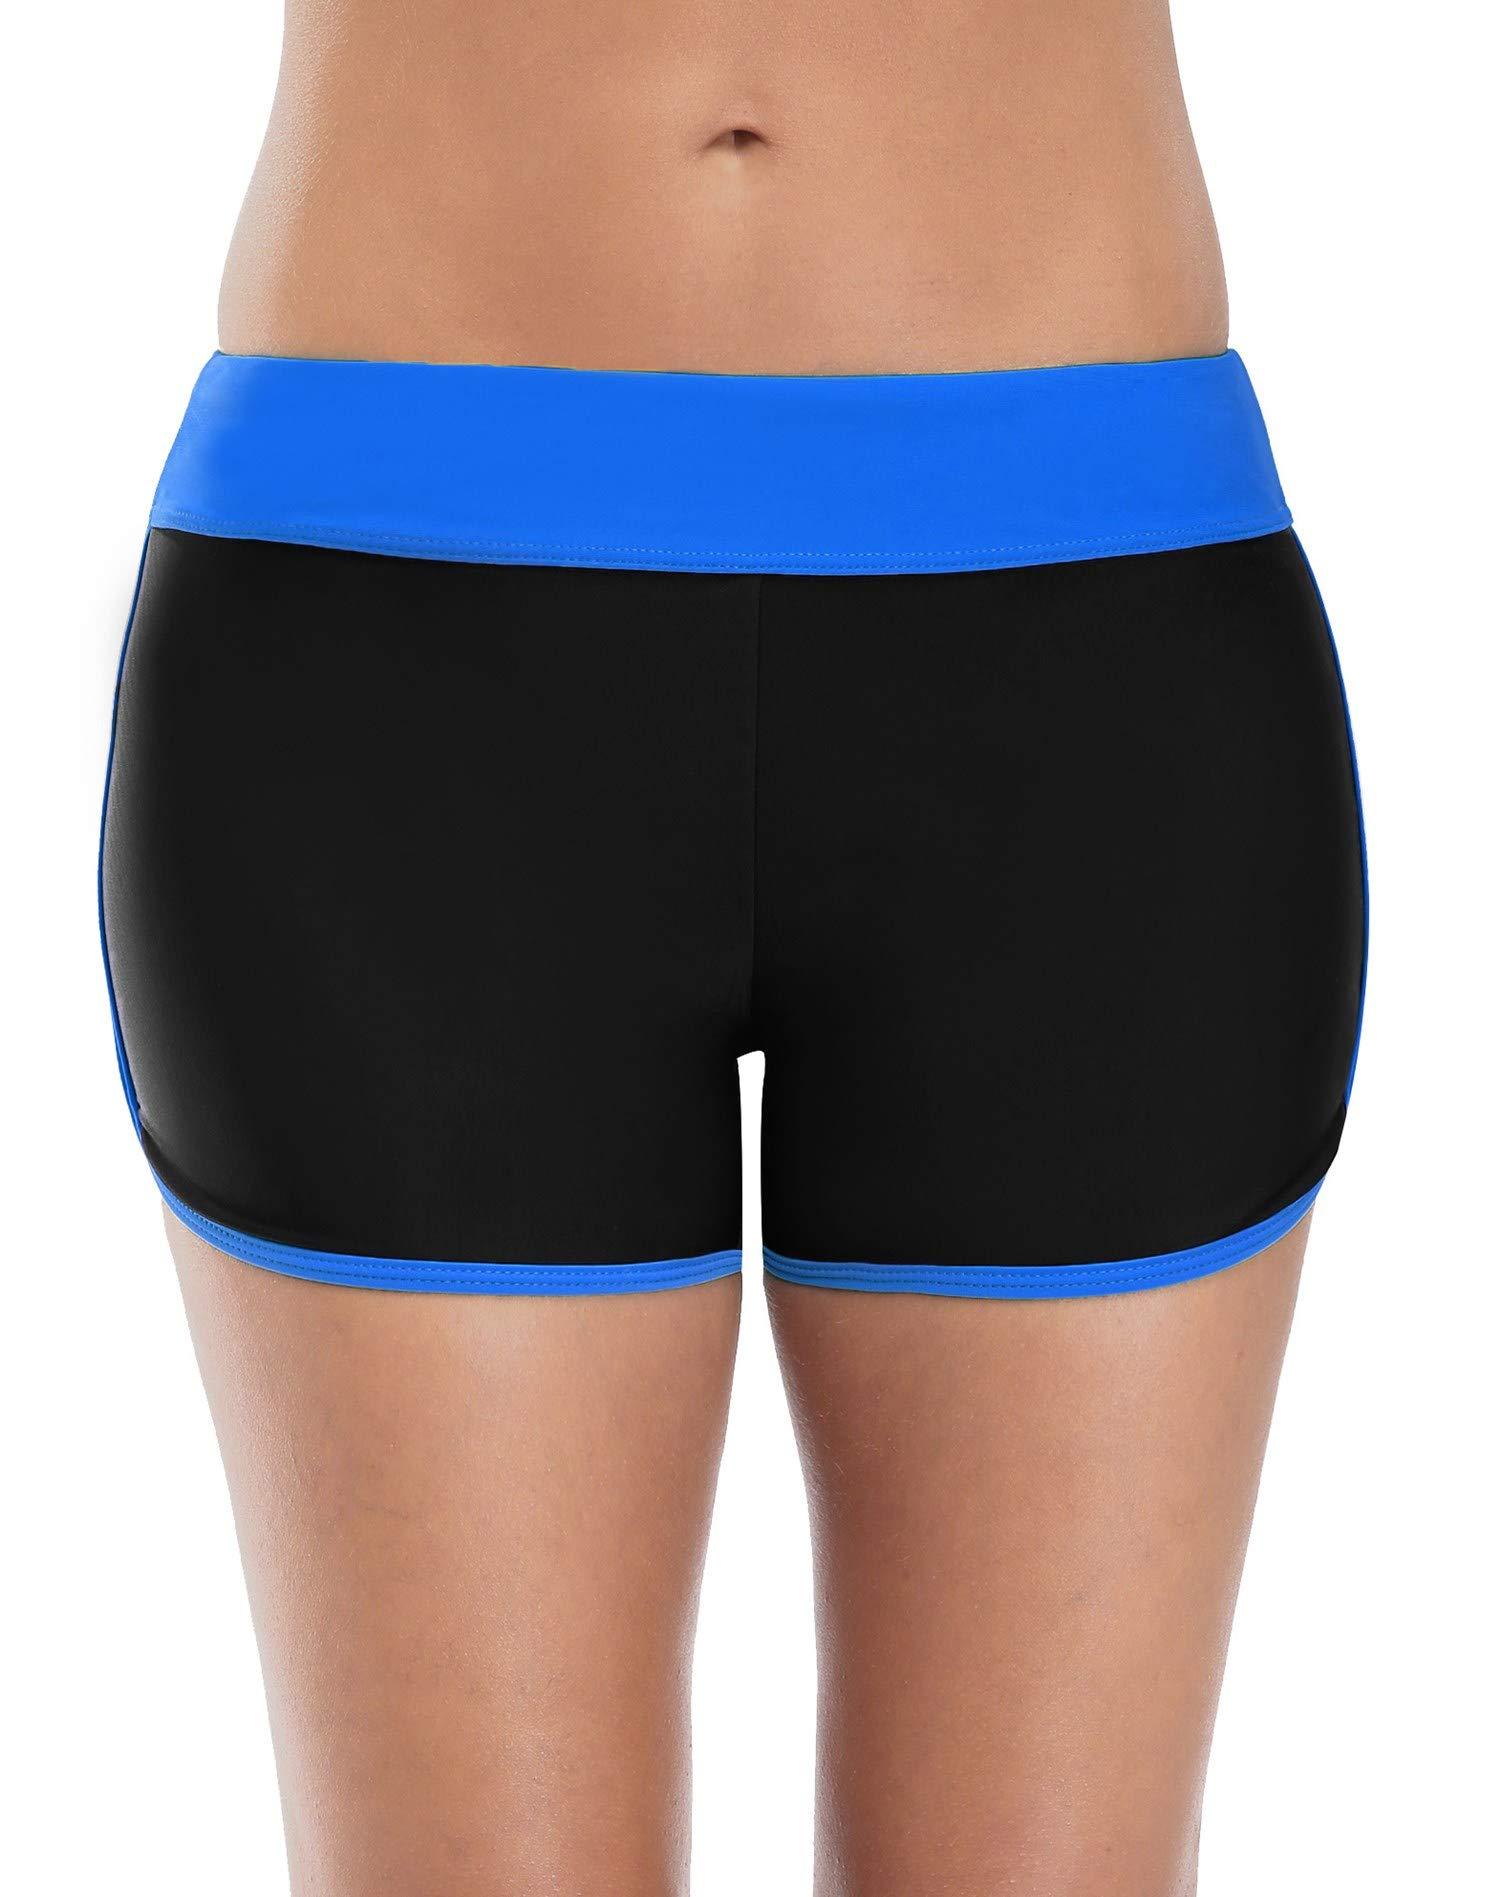 Anwell Womens Beach Board Short Mid Waisted Boyleg Swimsuit Bottoms Black Medium by Anwell